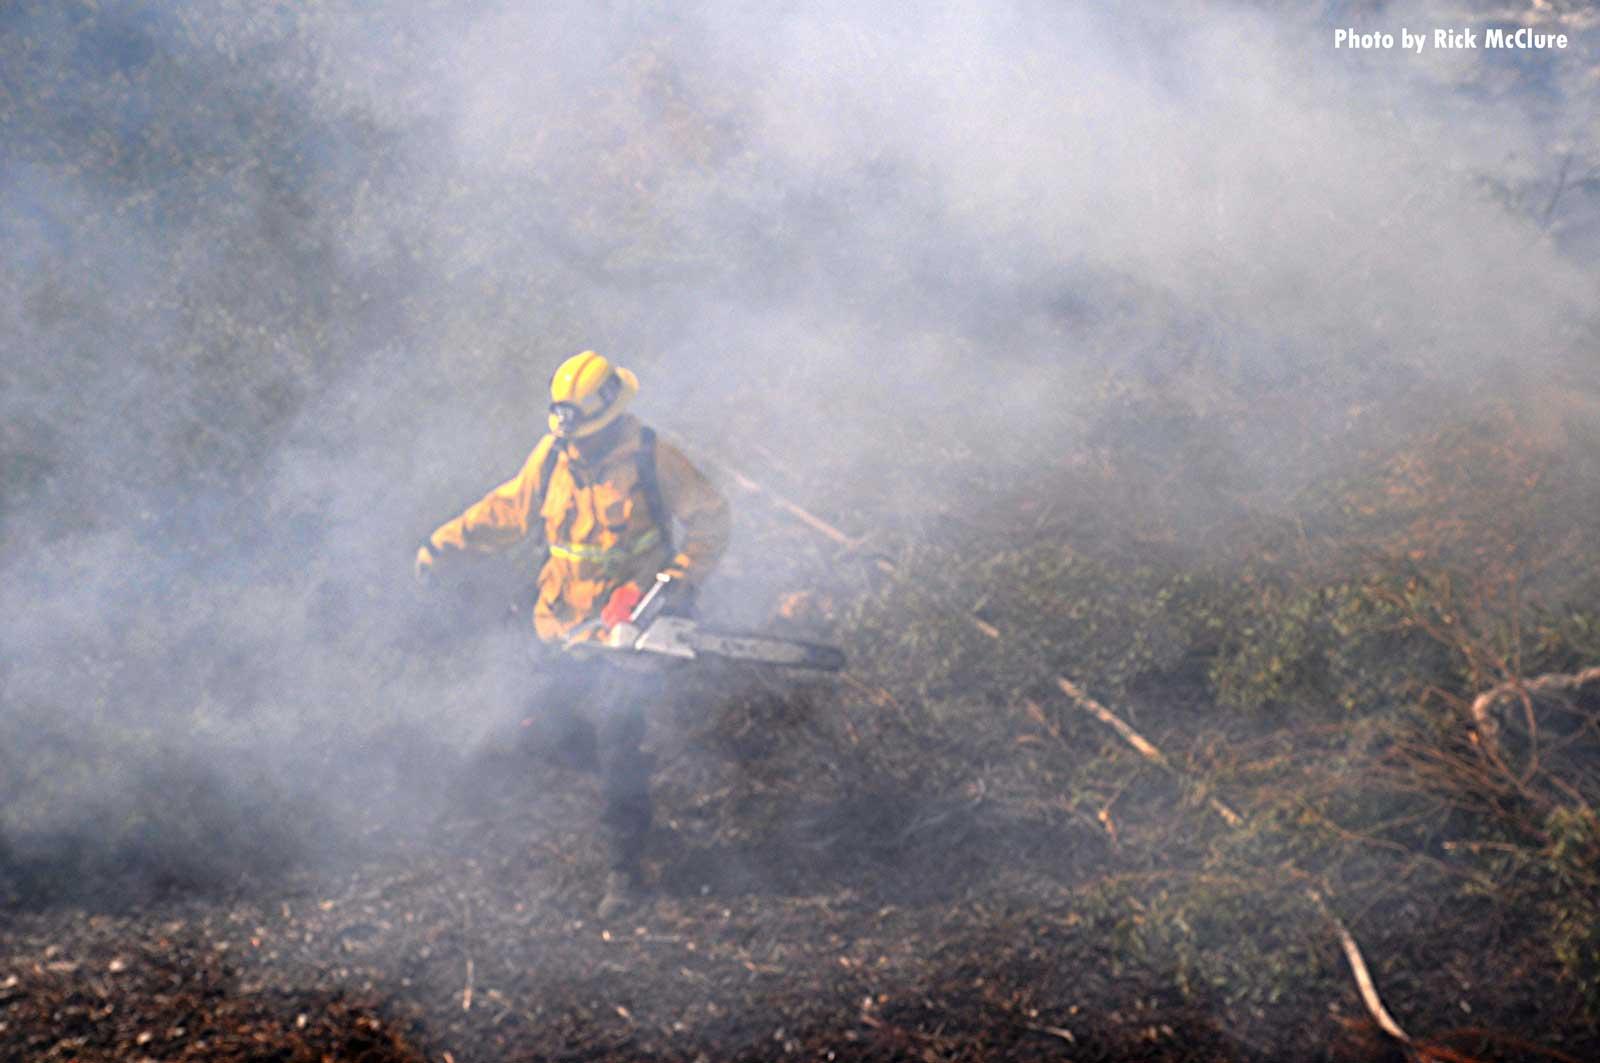 Firefighter operating in brush fire smoke